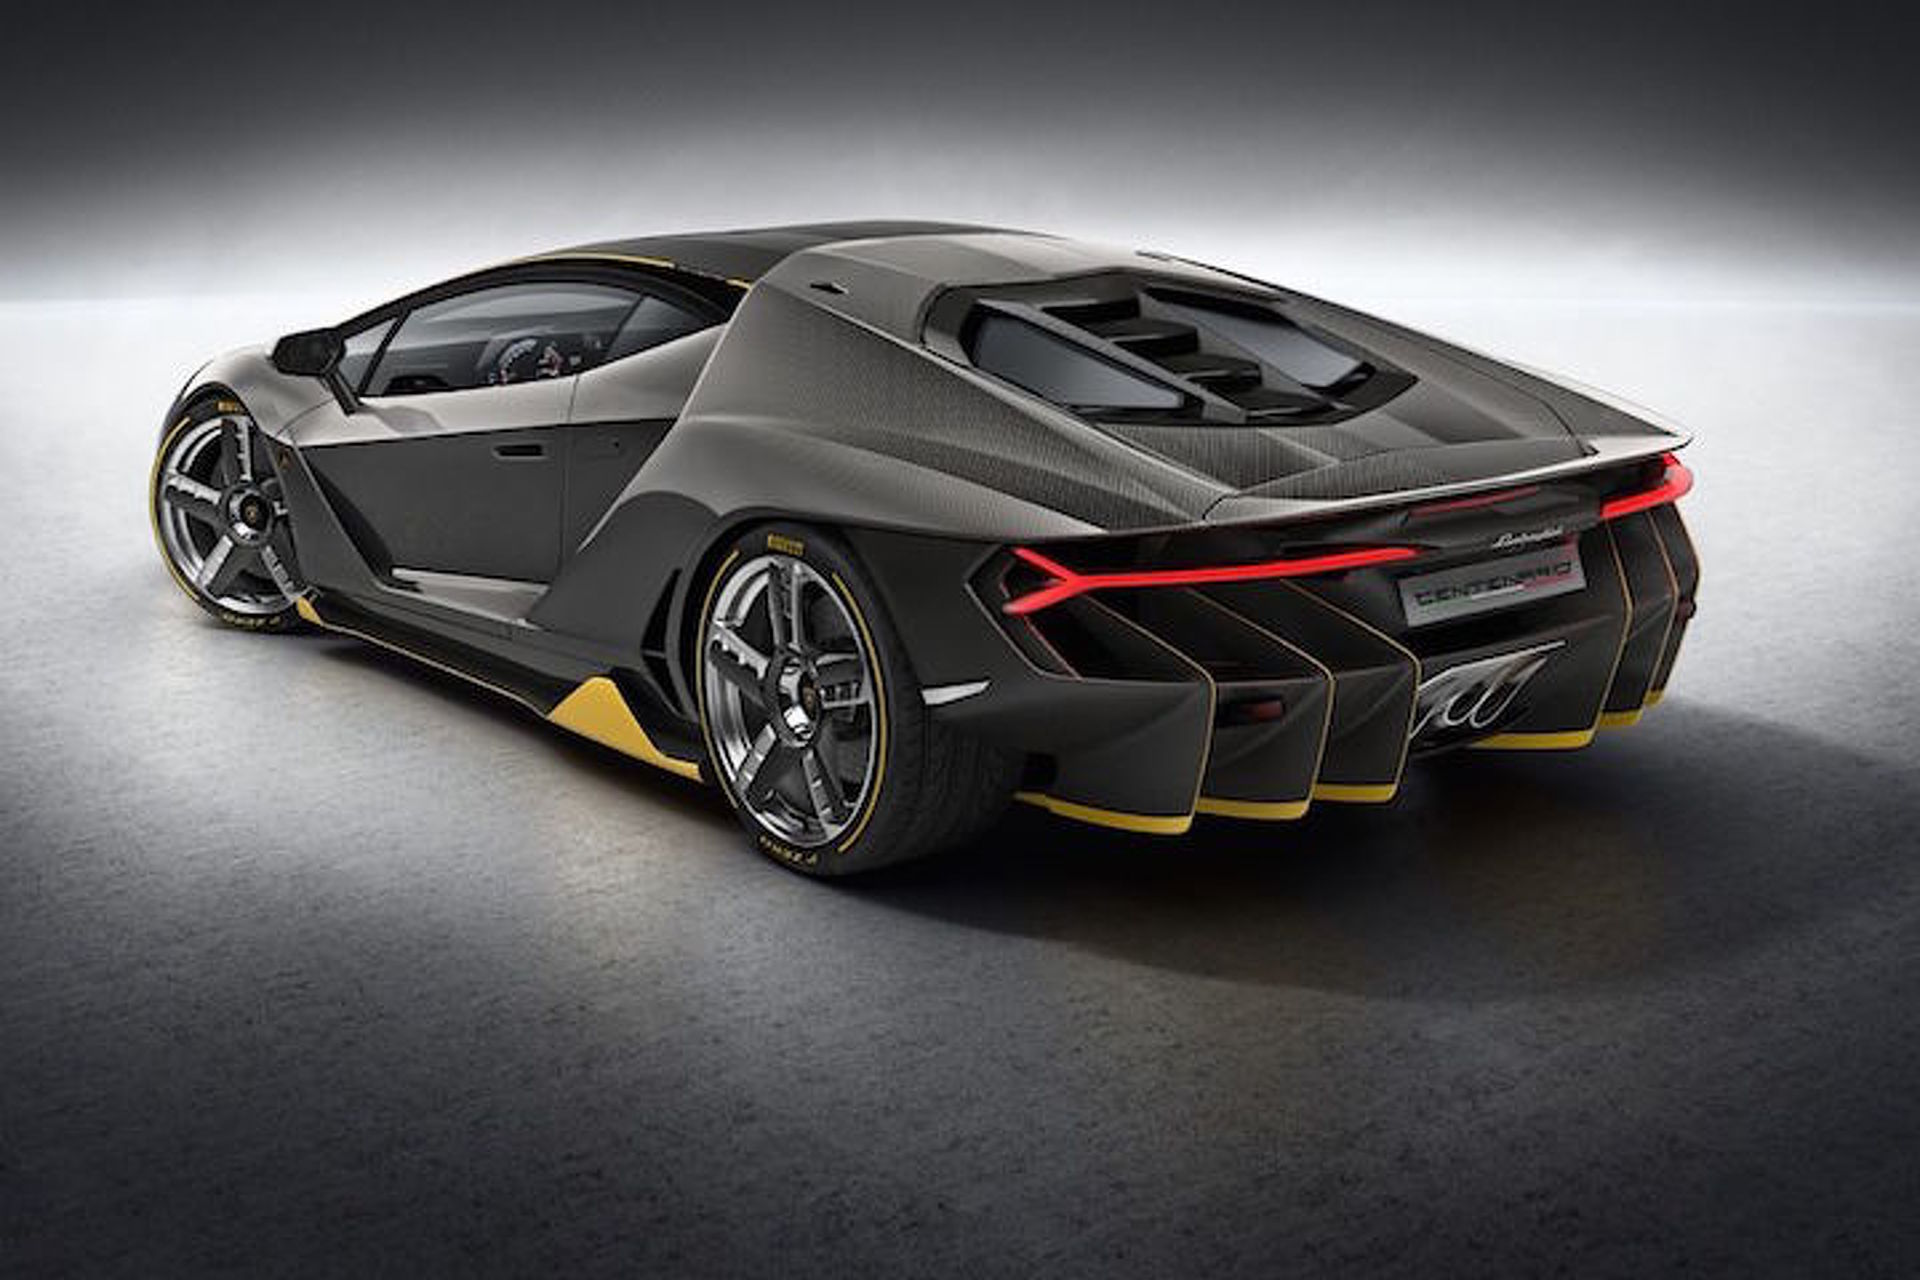 Lamborghini Celebrates A Century With 760HP Hypercar